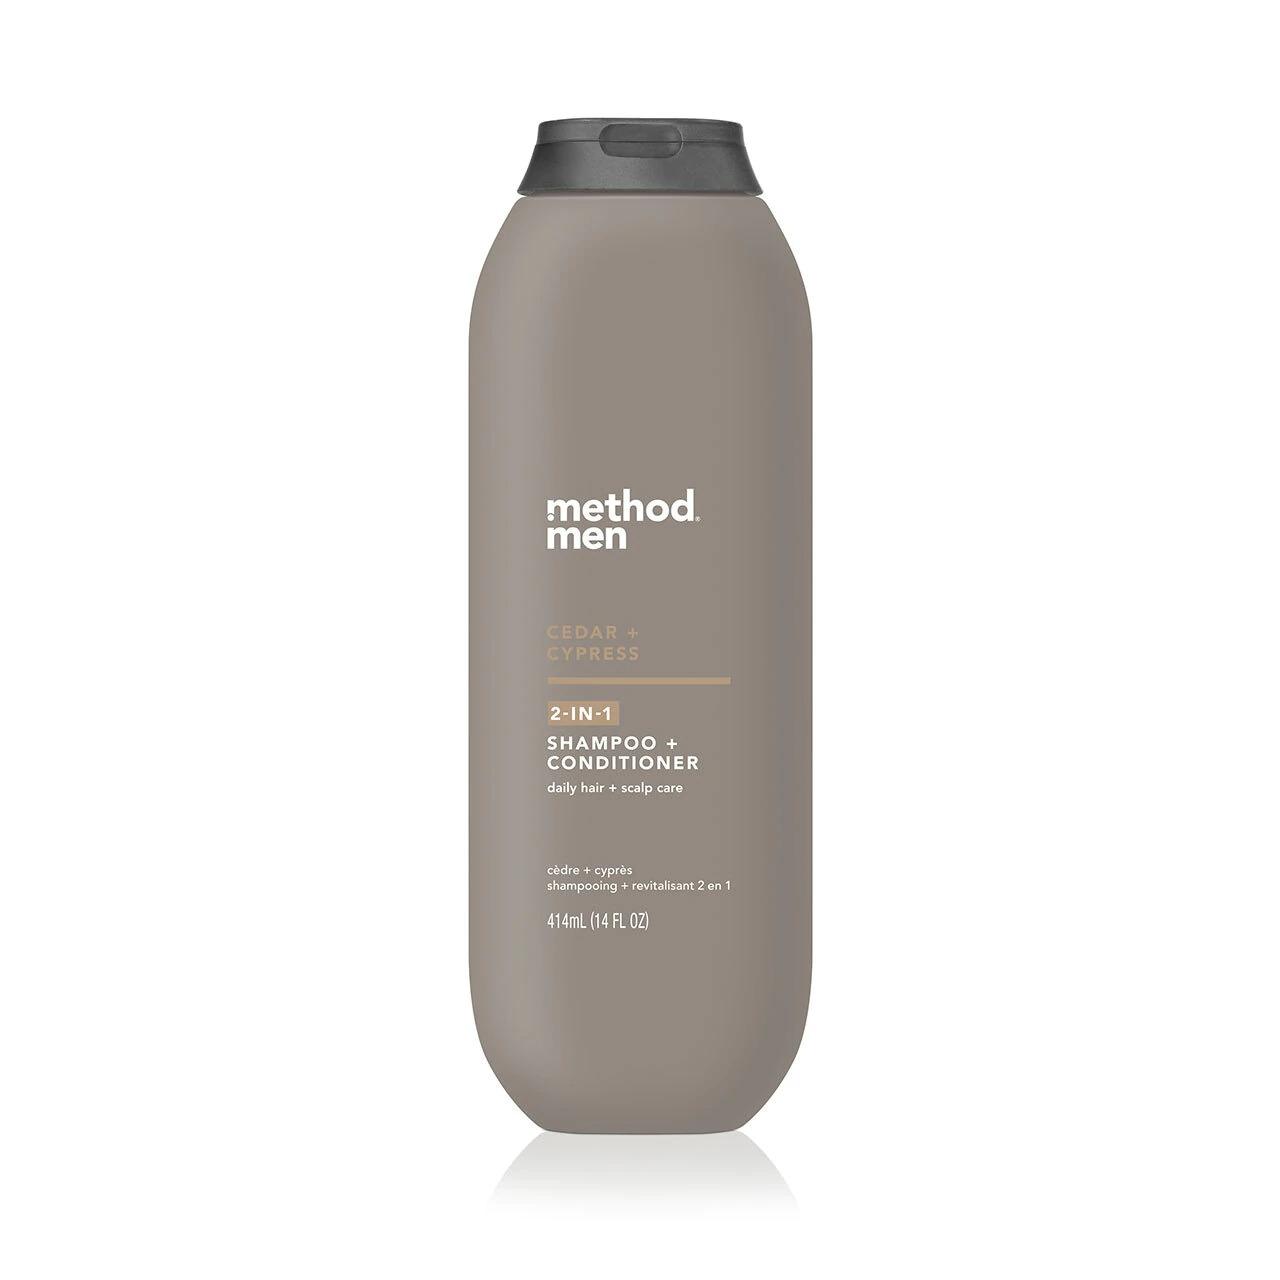 Method Men Cedar + Cypress 2-in-1 shampoo and conditioner for men